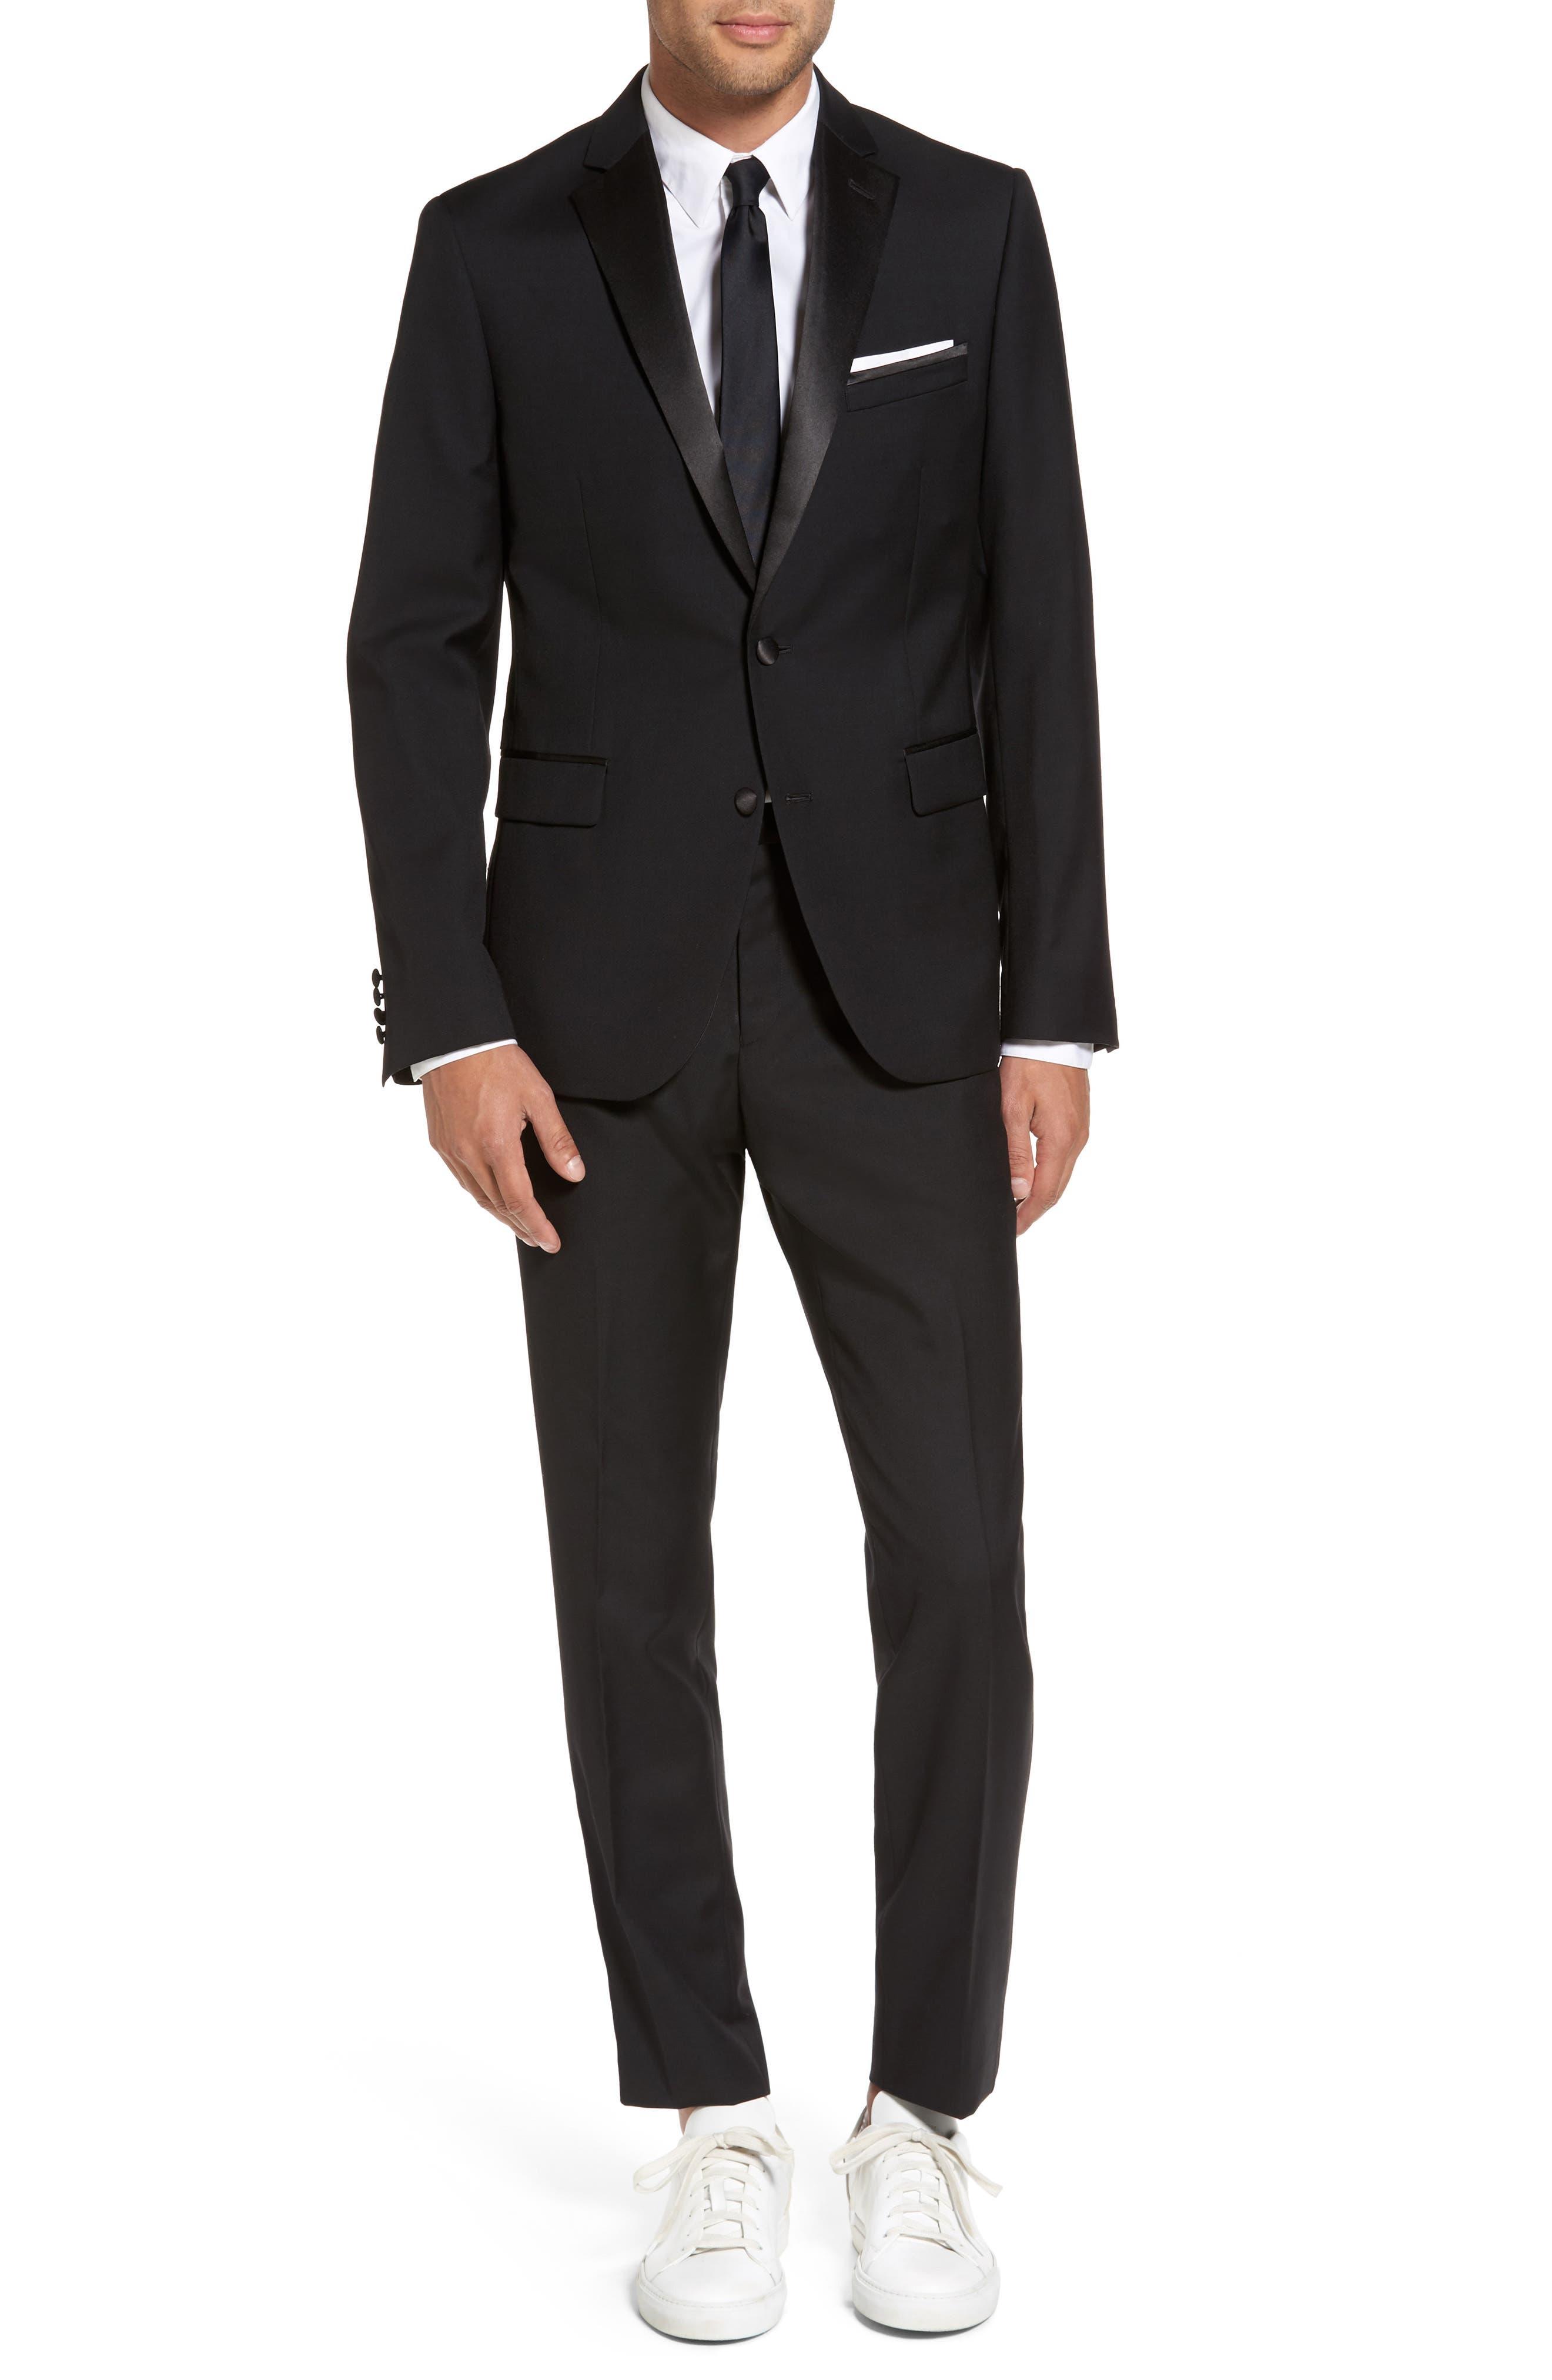 Alternate Image 1 Selected - Calibrate Trim Fit Wool Blend Tuxedo